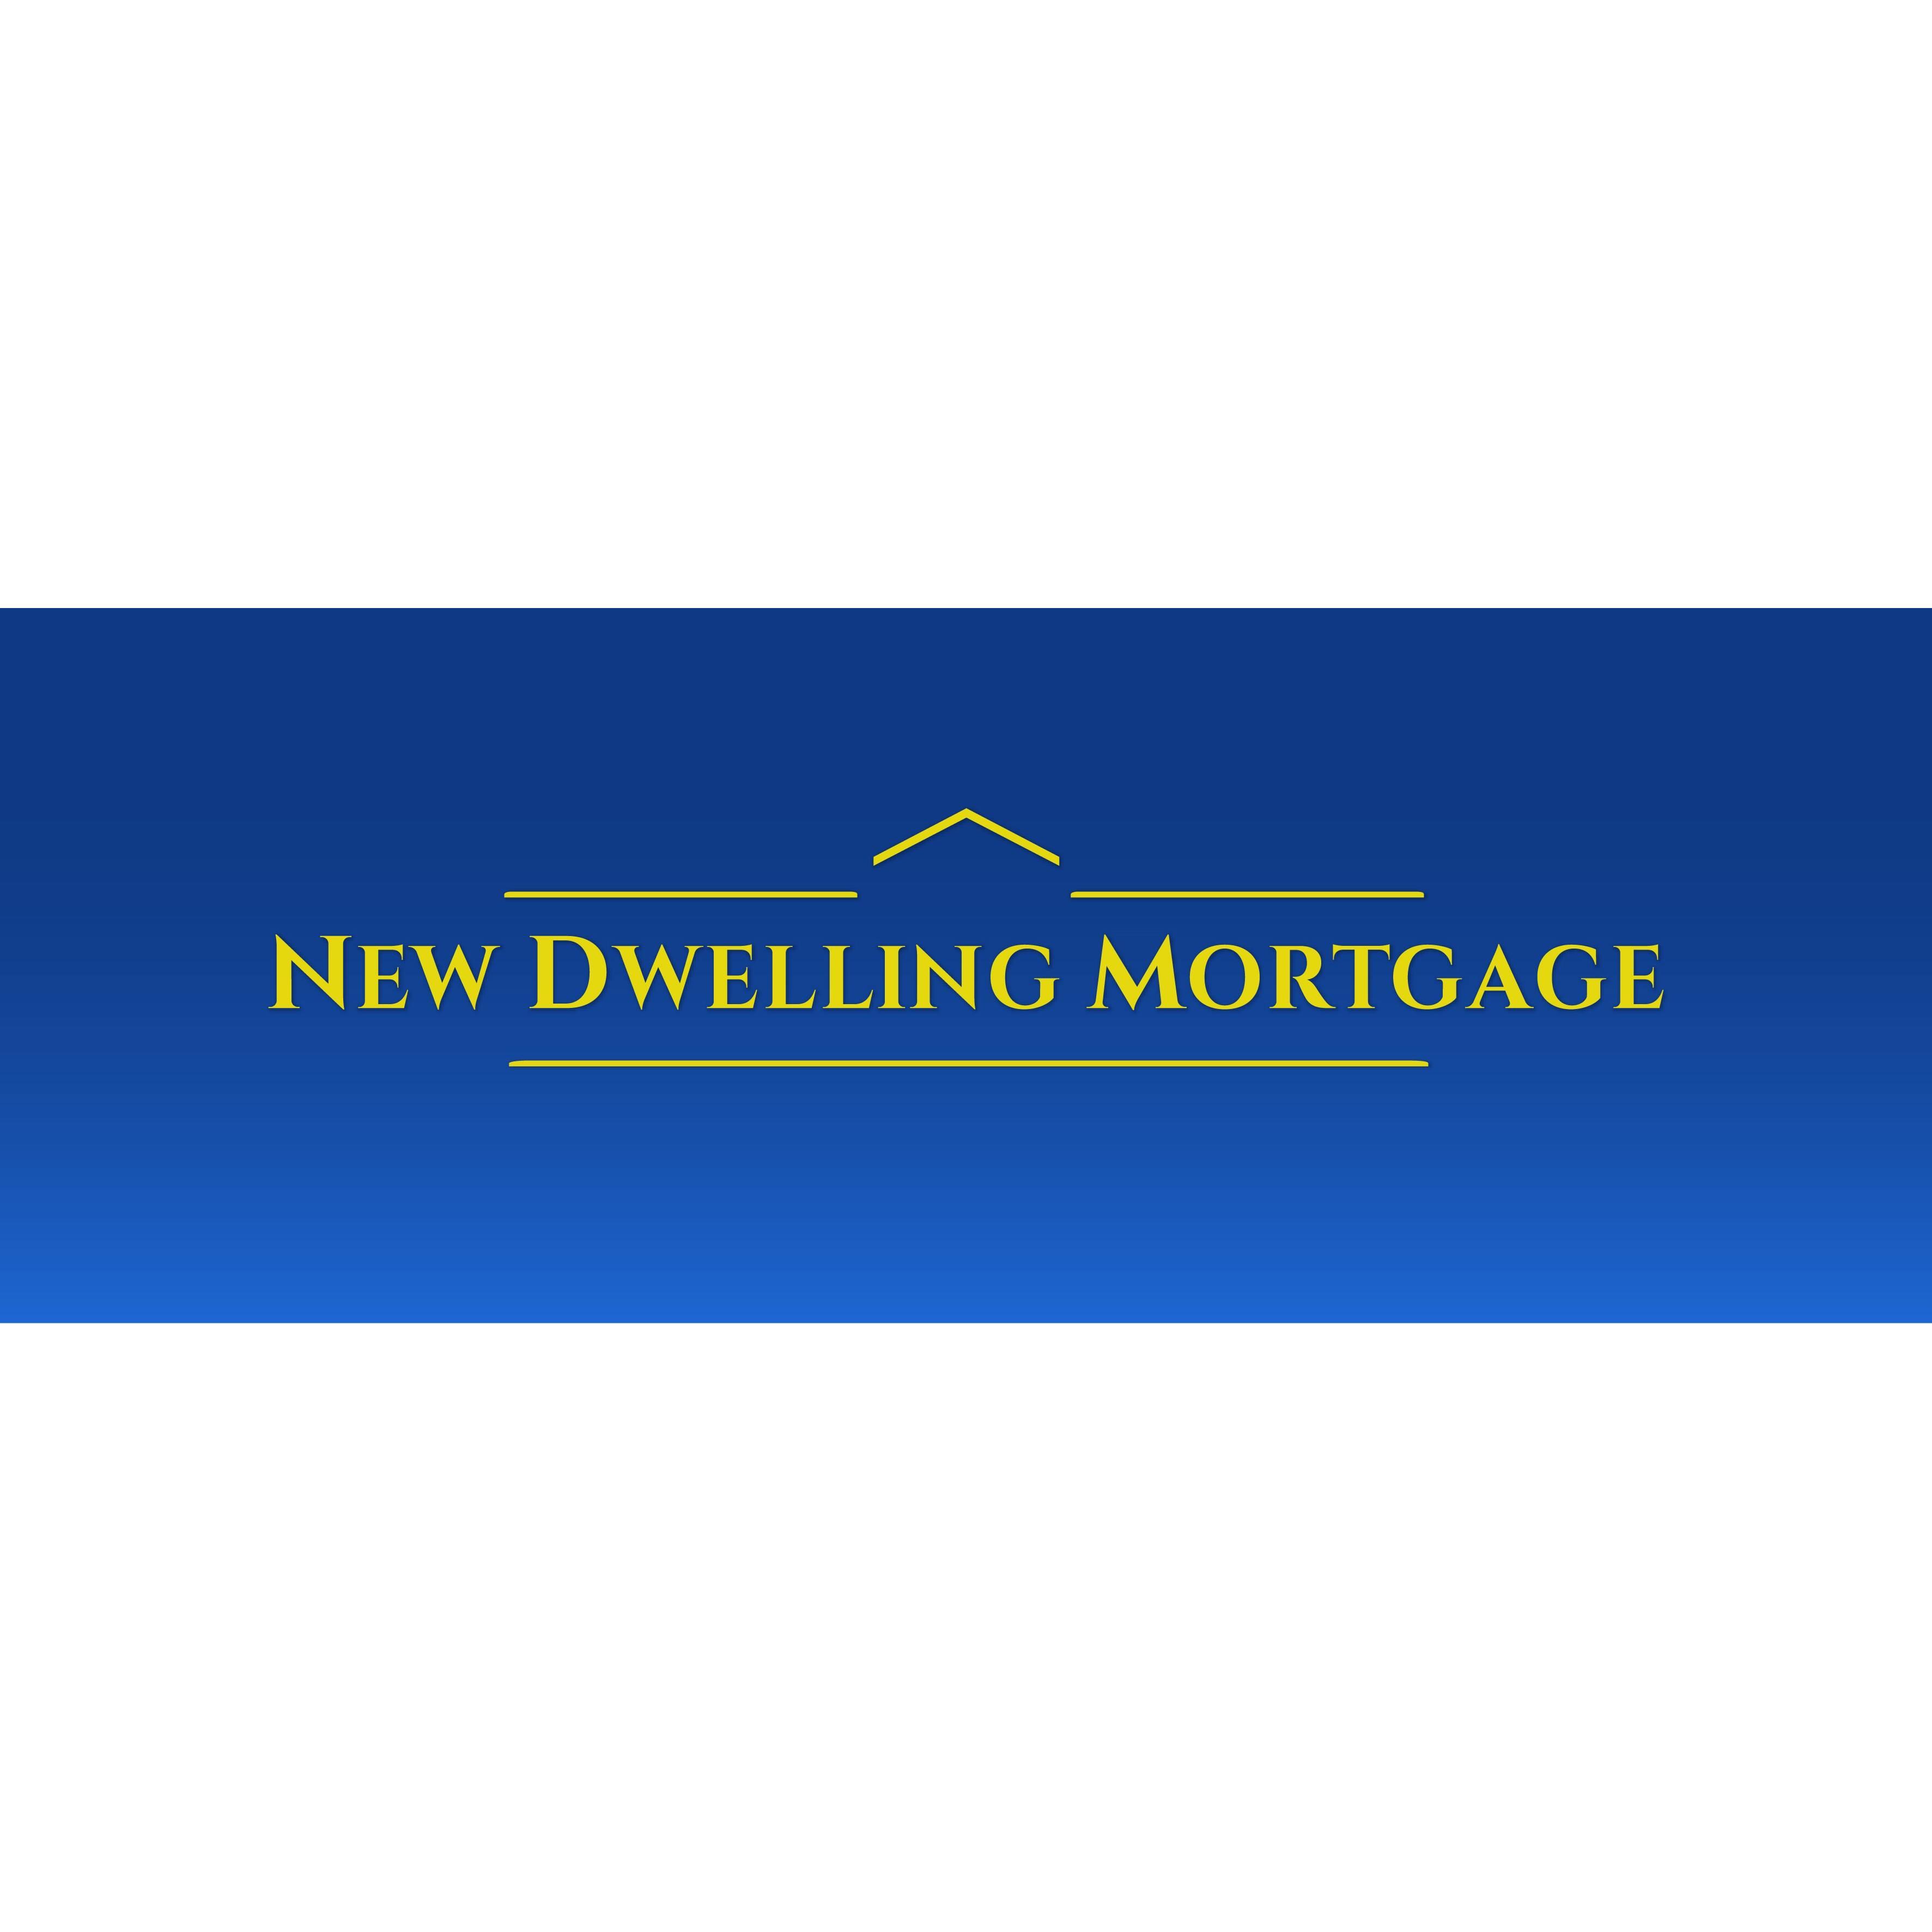 New Dwelling Mortgage